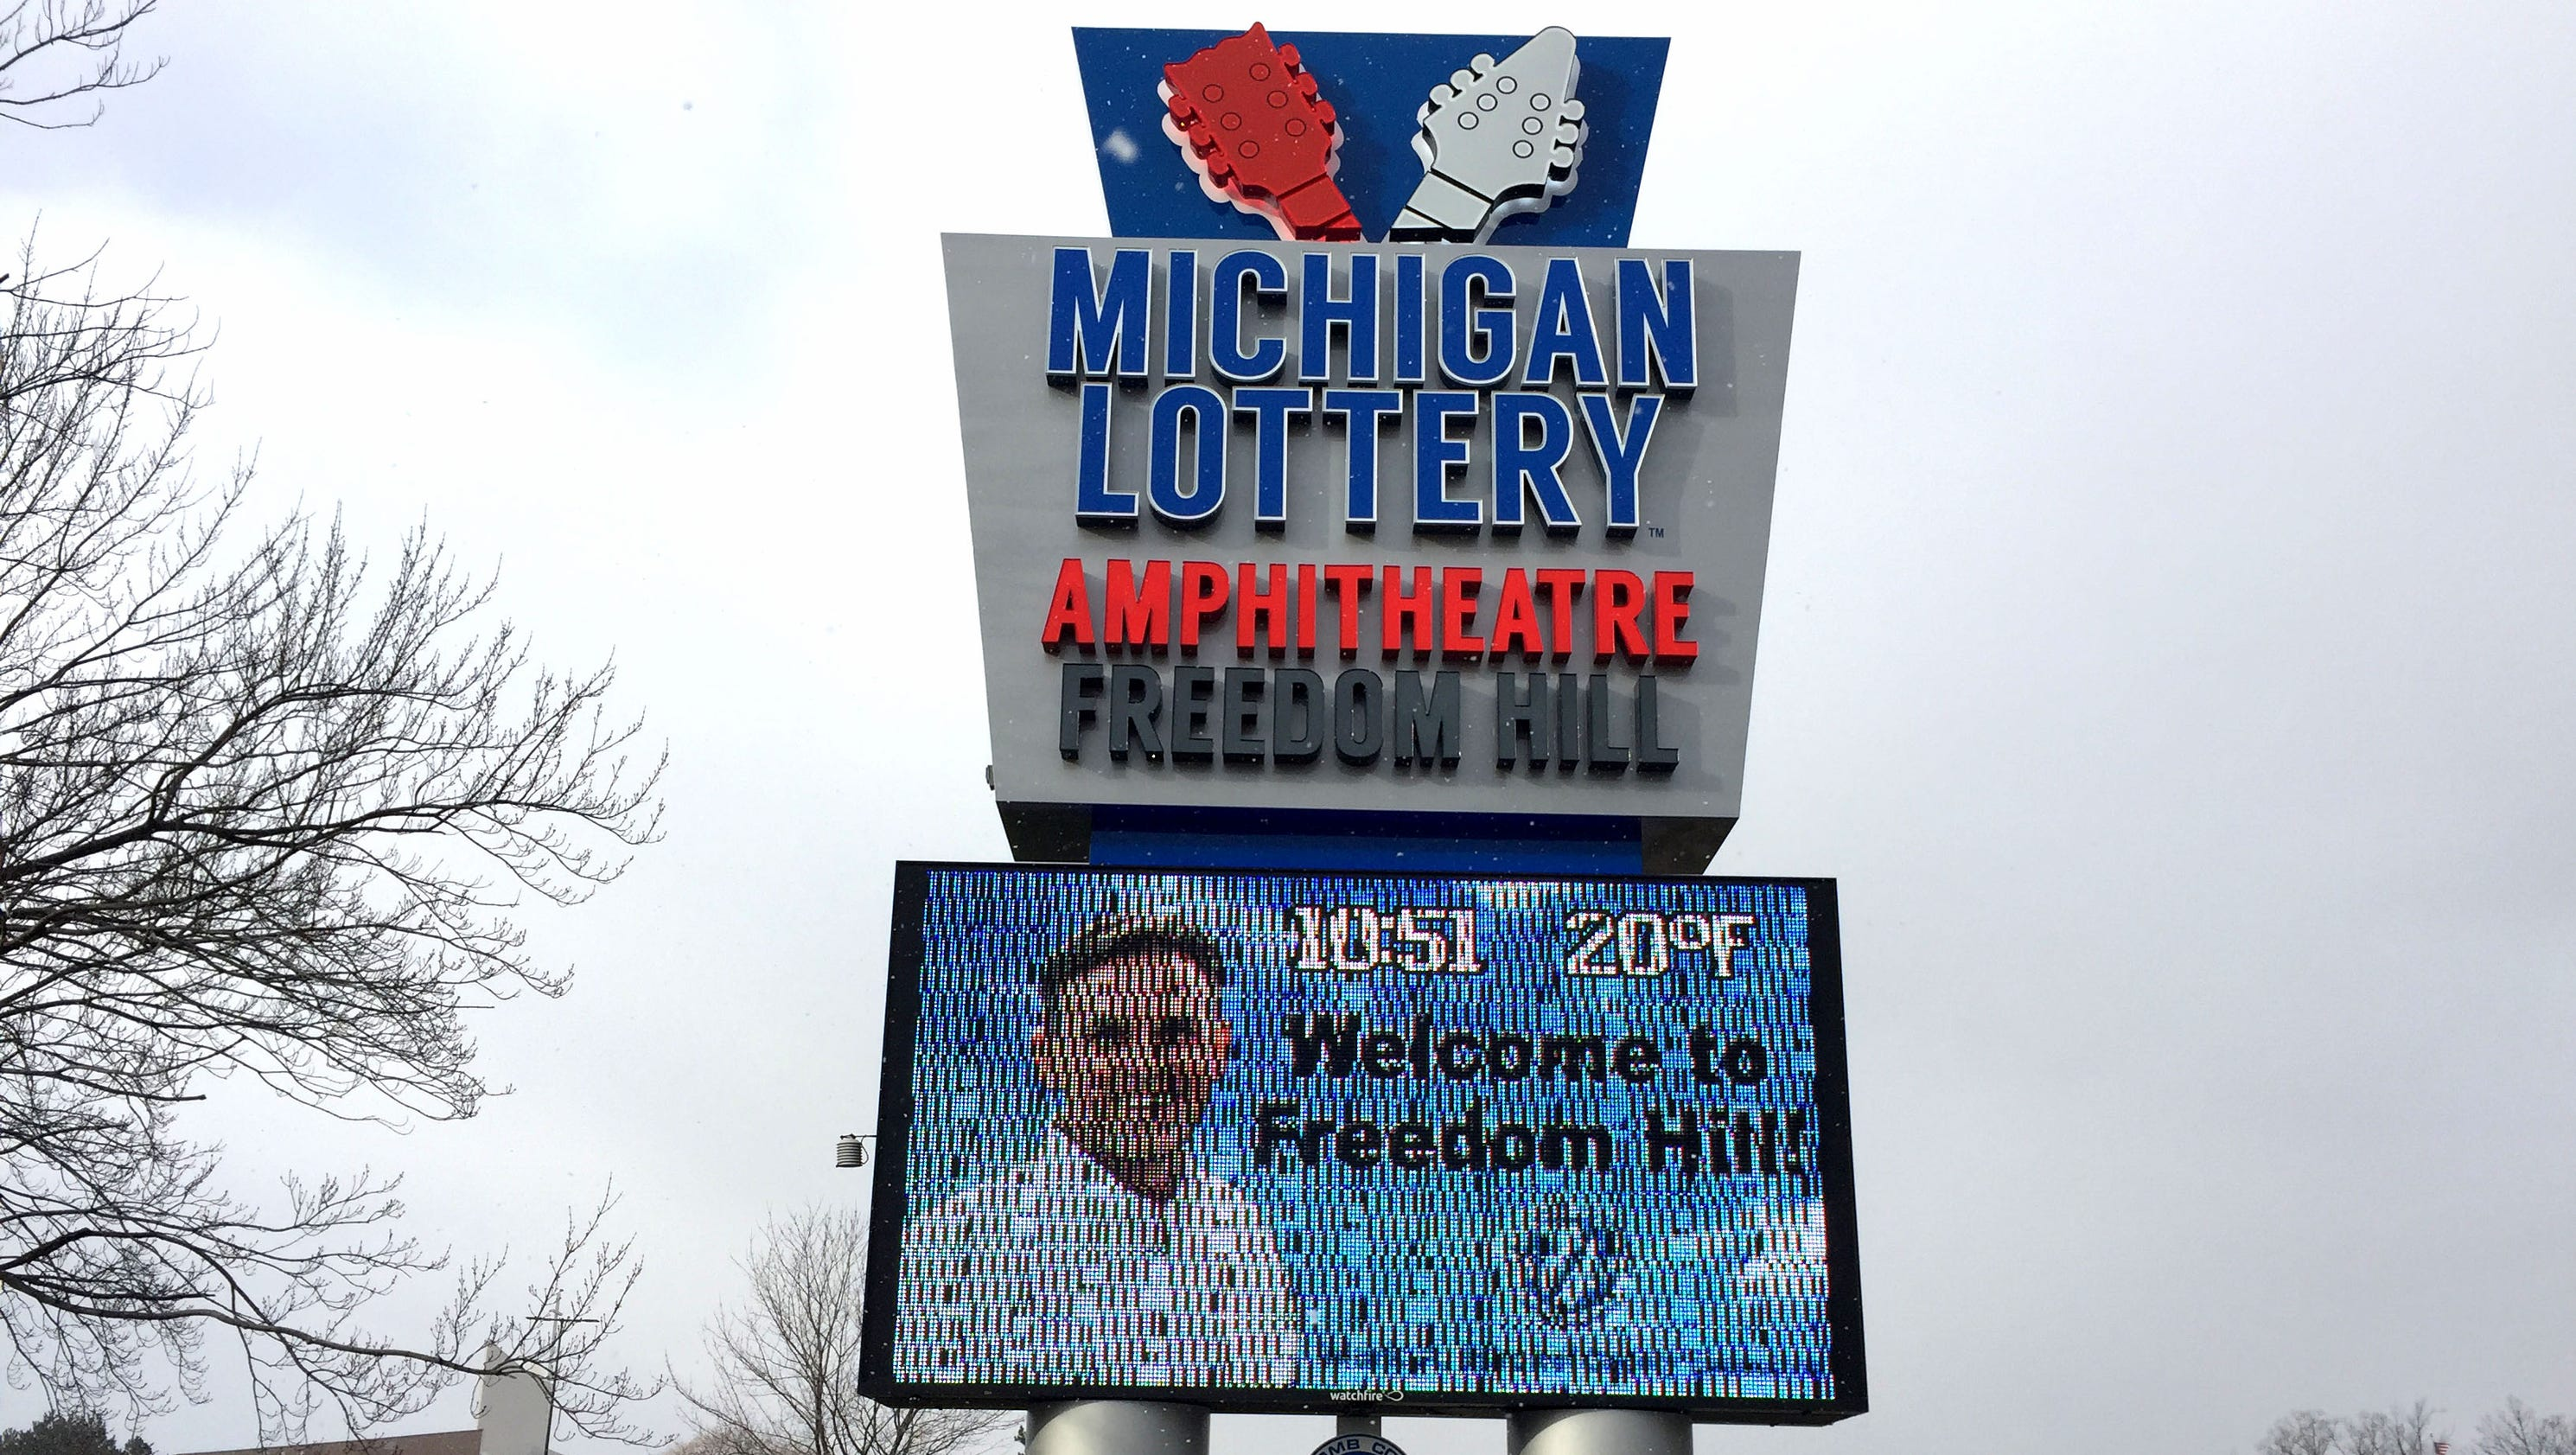 Michigan Lottery gives $900K sponsorship to amphitheater